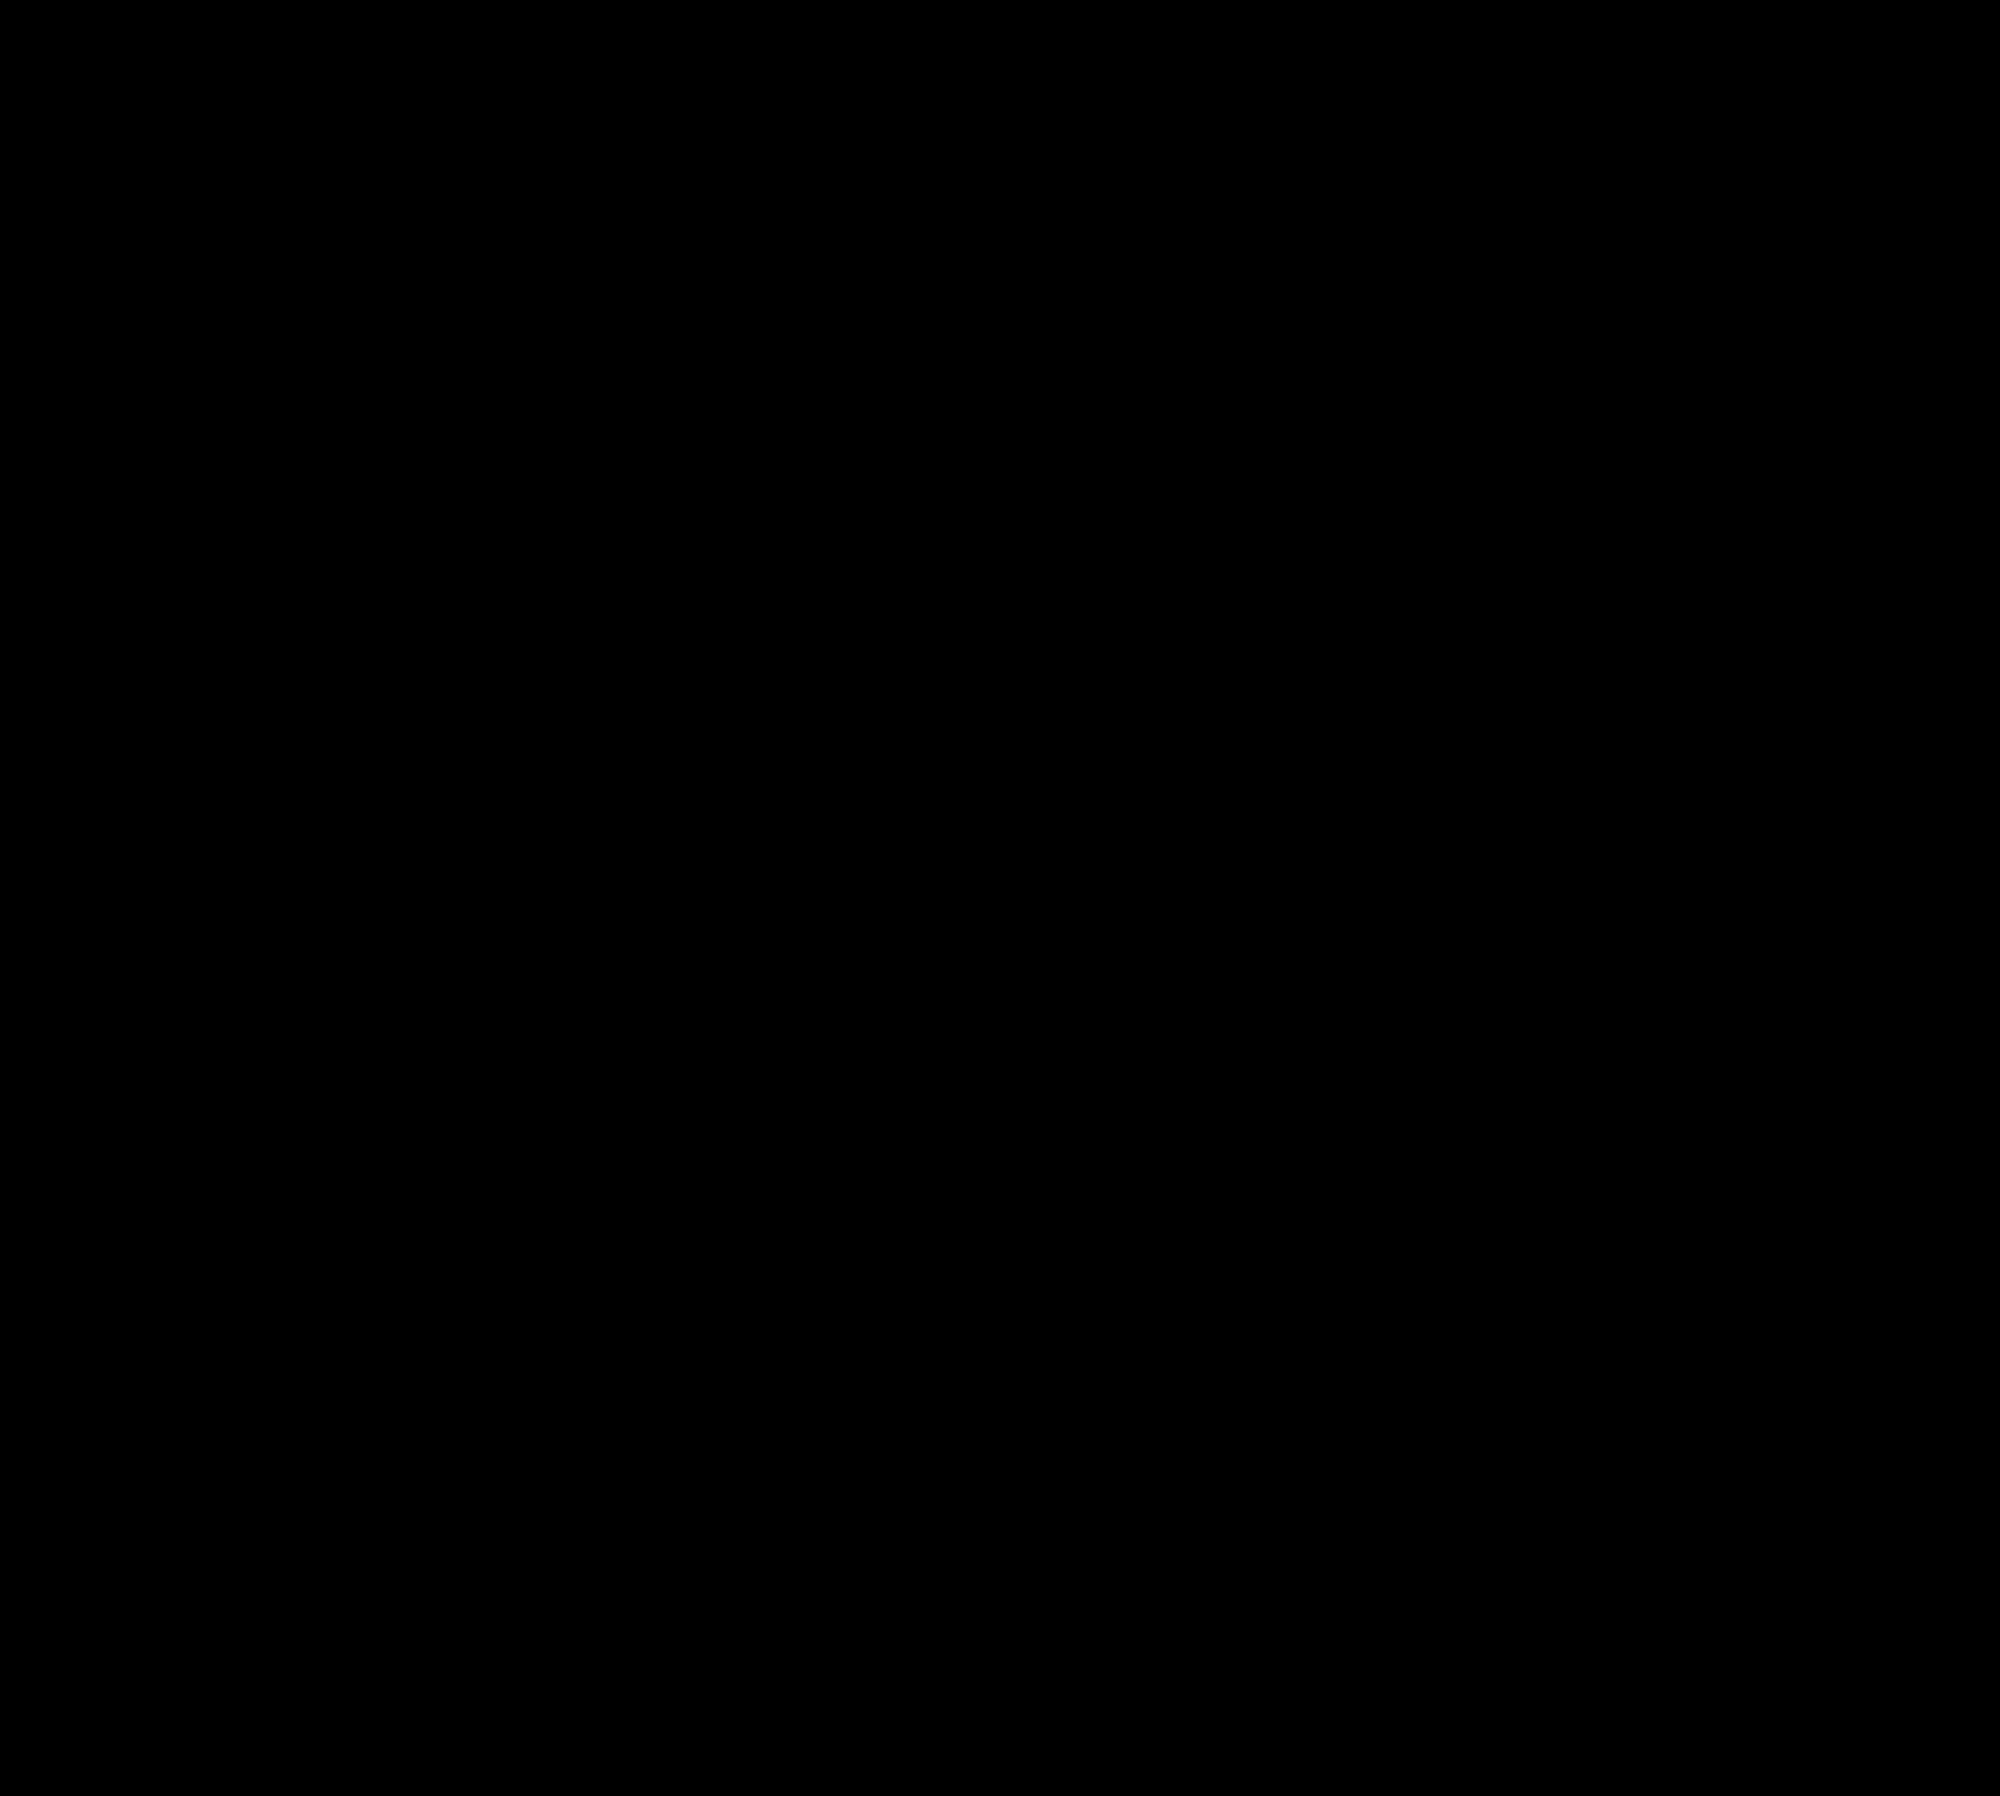 Uu flower chalice clipart clip transparent stock Flaming chalice - Wikipedia clip transparent stock